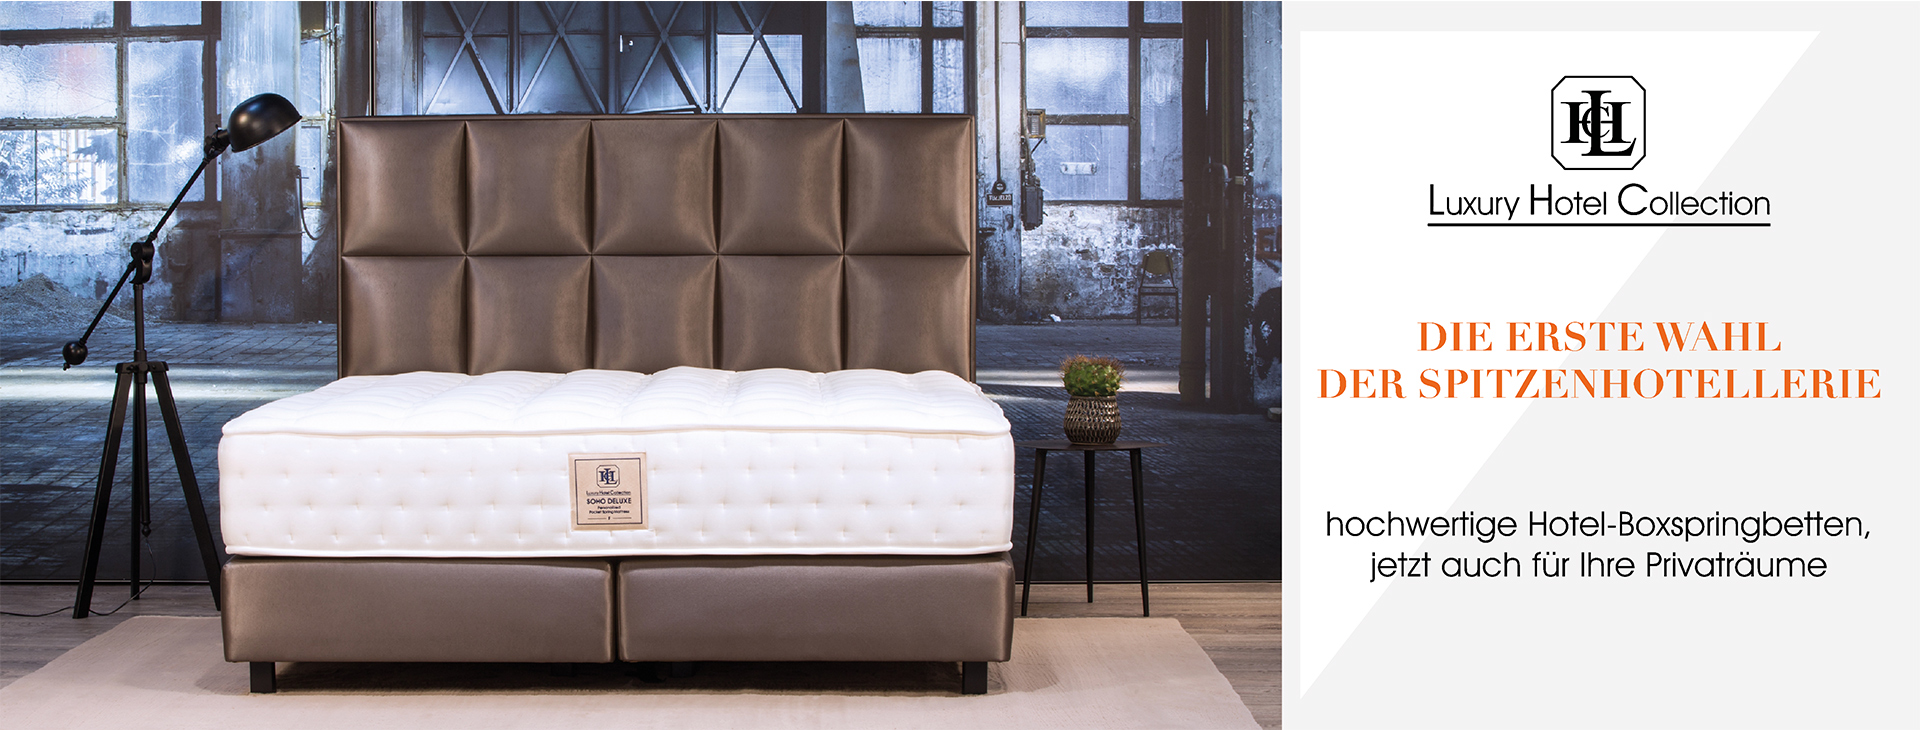 Boxspringbetten Luxury Hotel Collection